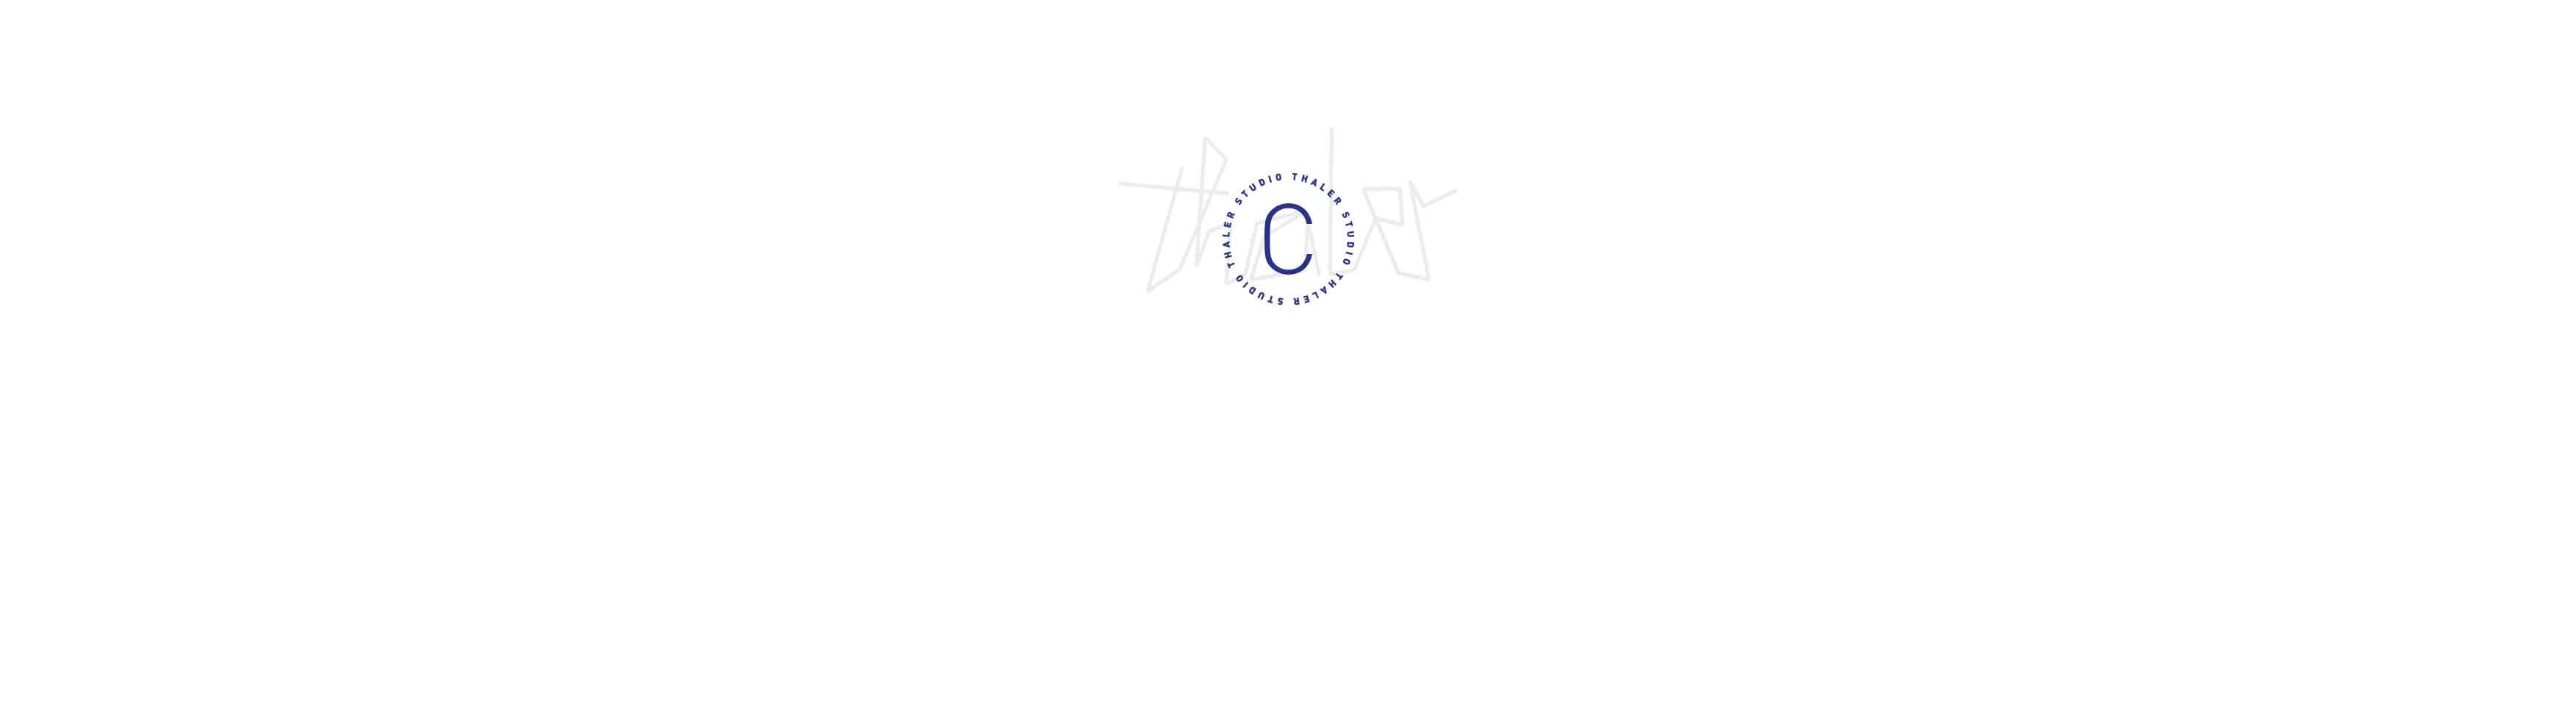 9-copyright-tag-studio-thaler-branding-website-logo-augsburg